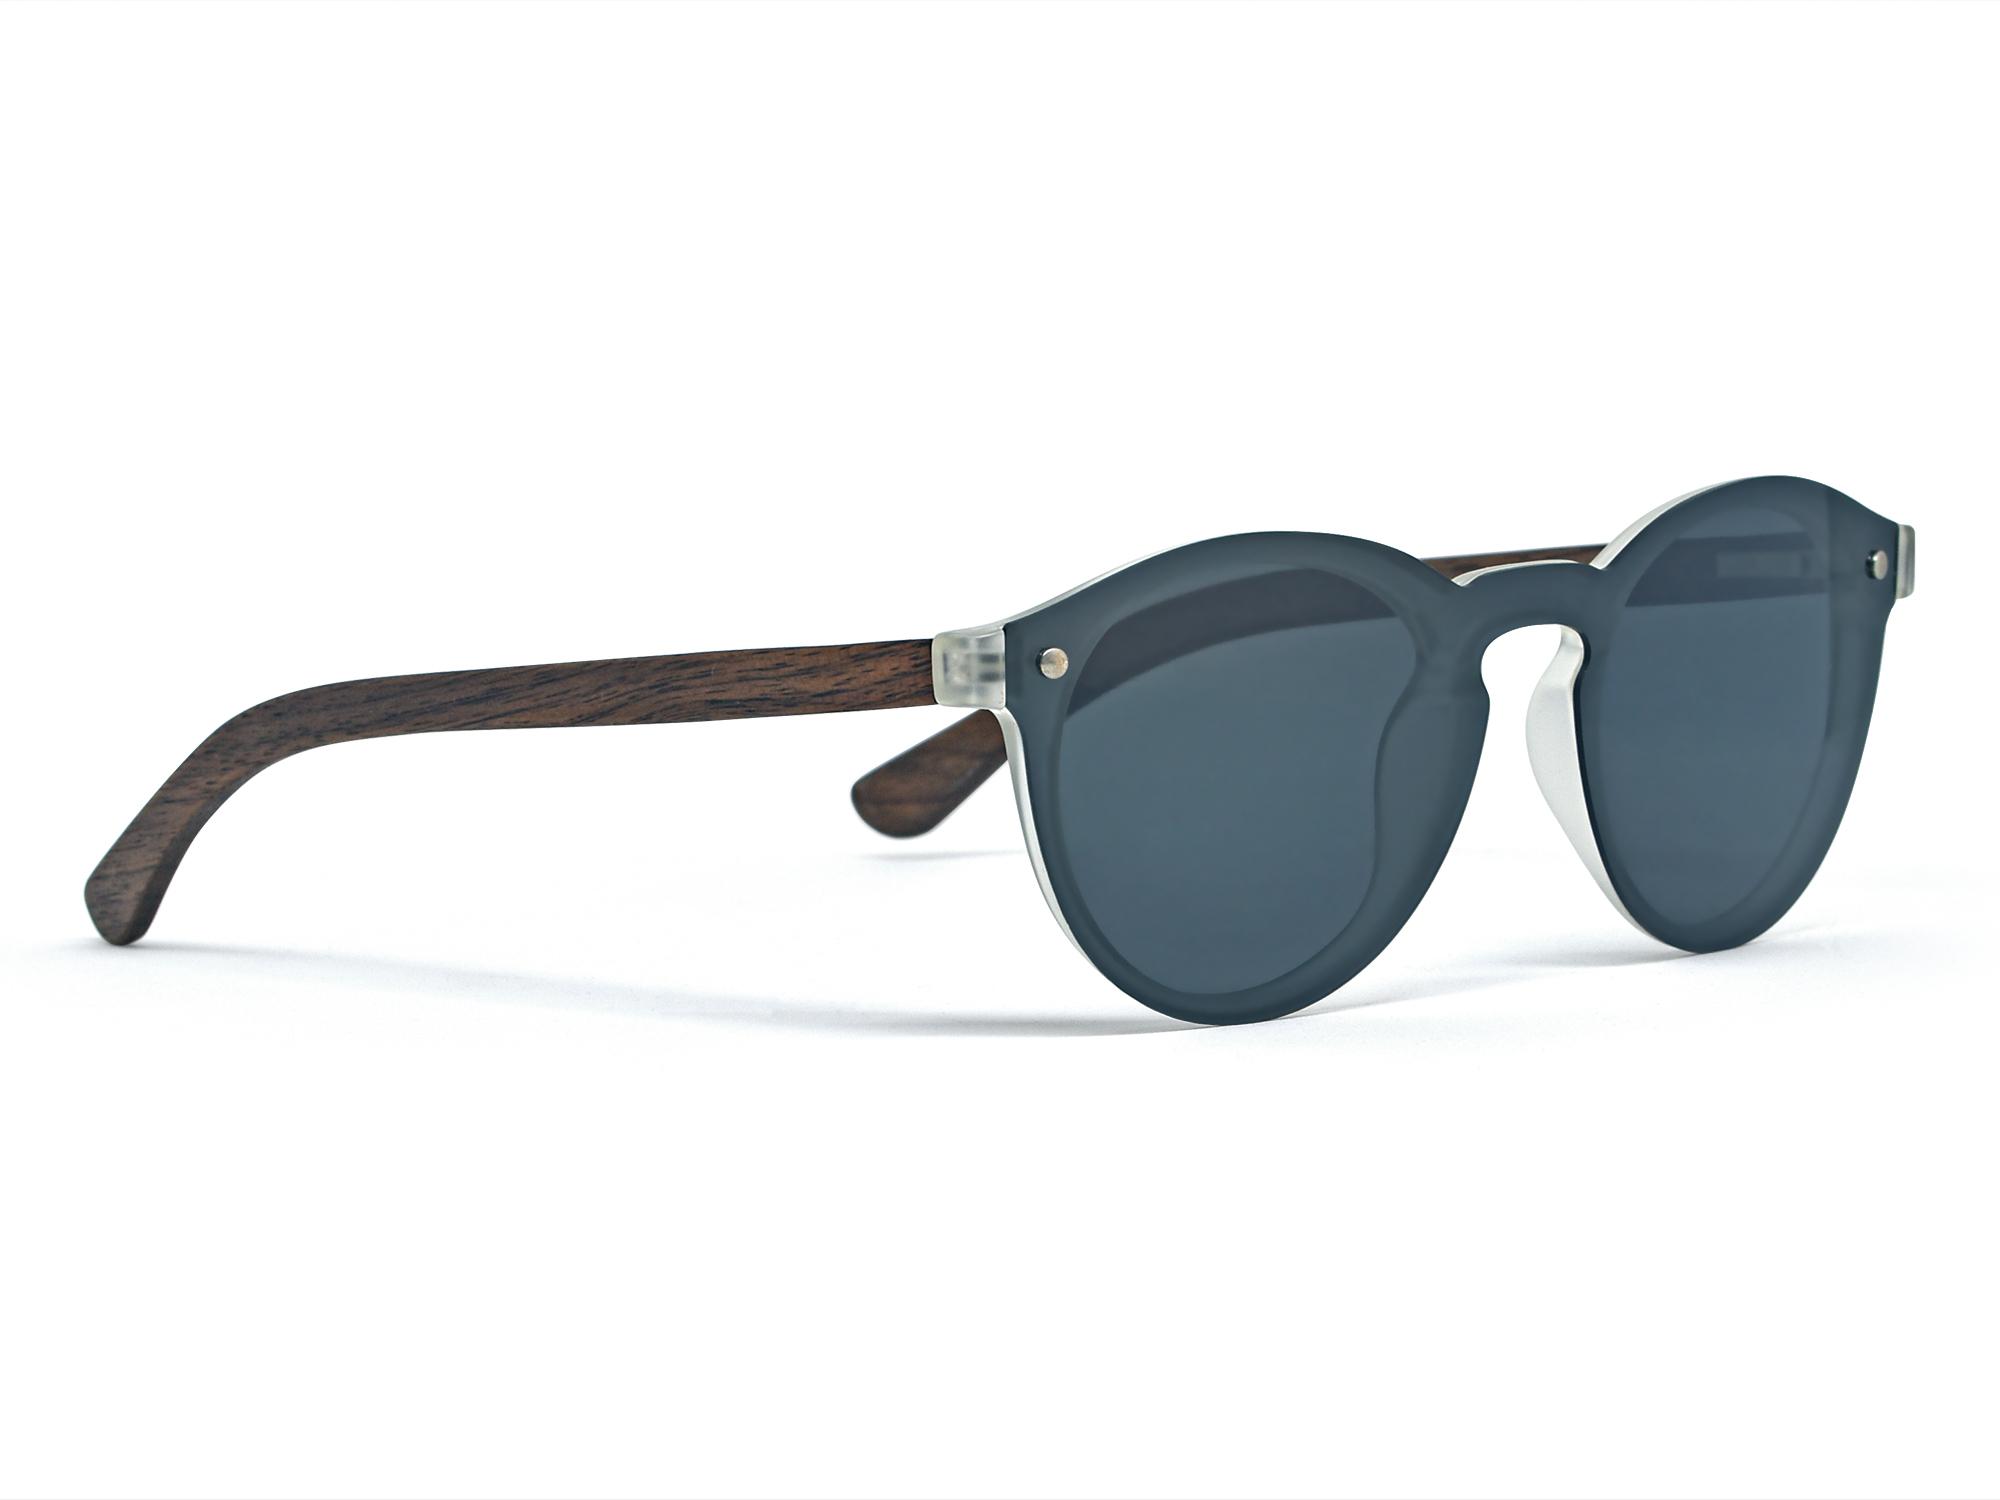 round walnut wood sunglasses